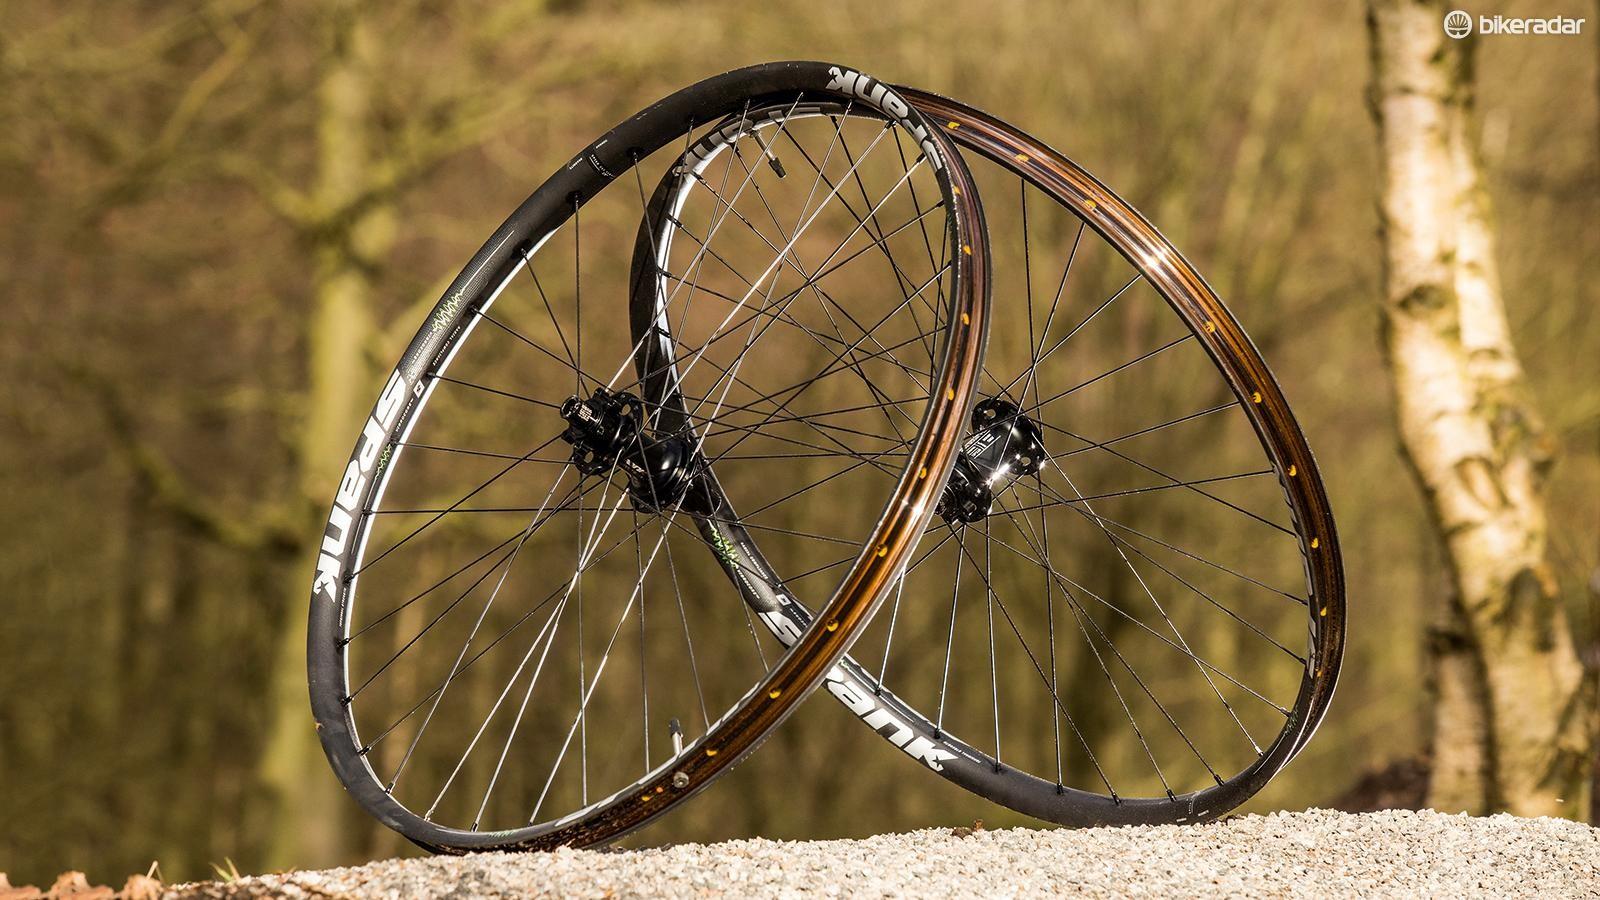 Spank's Spike 350 Vibrocore wheelset